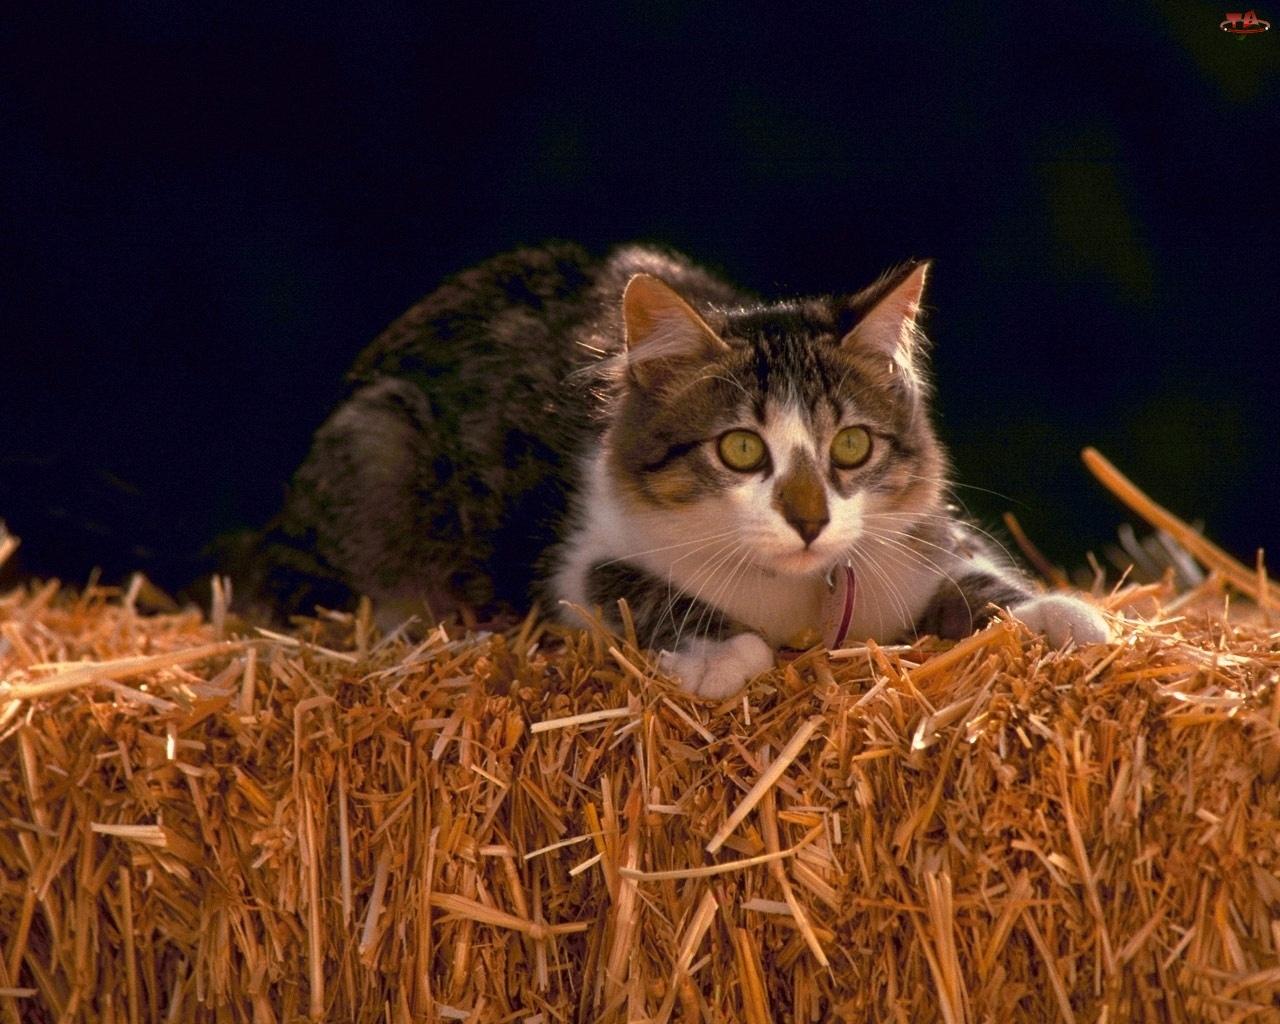 Polowanie, Kot, Słoma